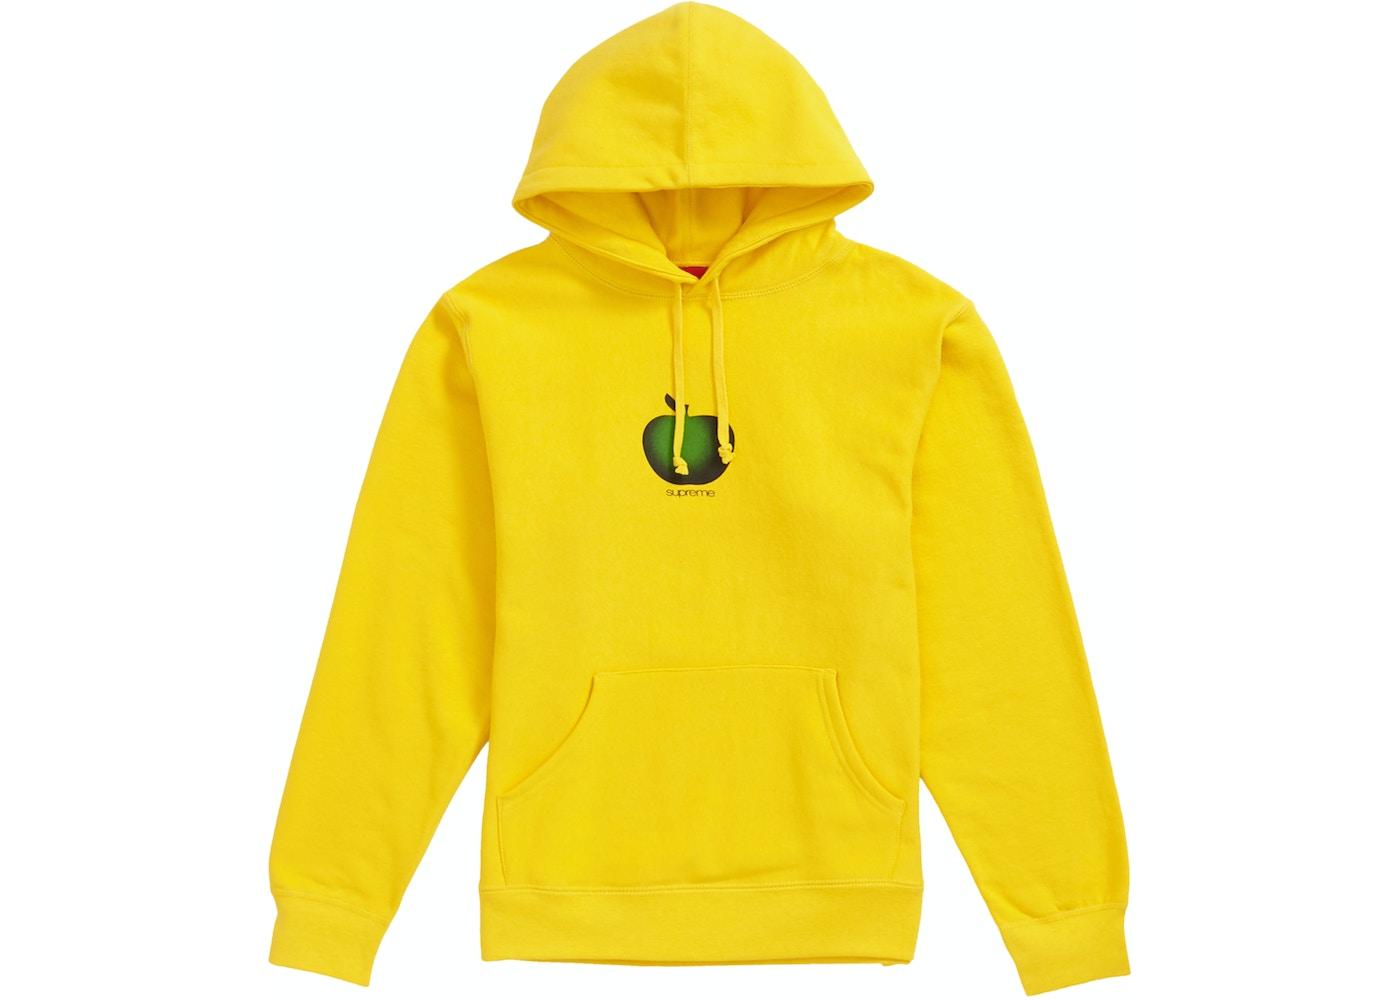 d8aca444c Supreme Apple Hooded Sweatshirt Yellow - SS19